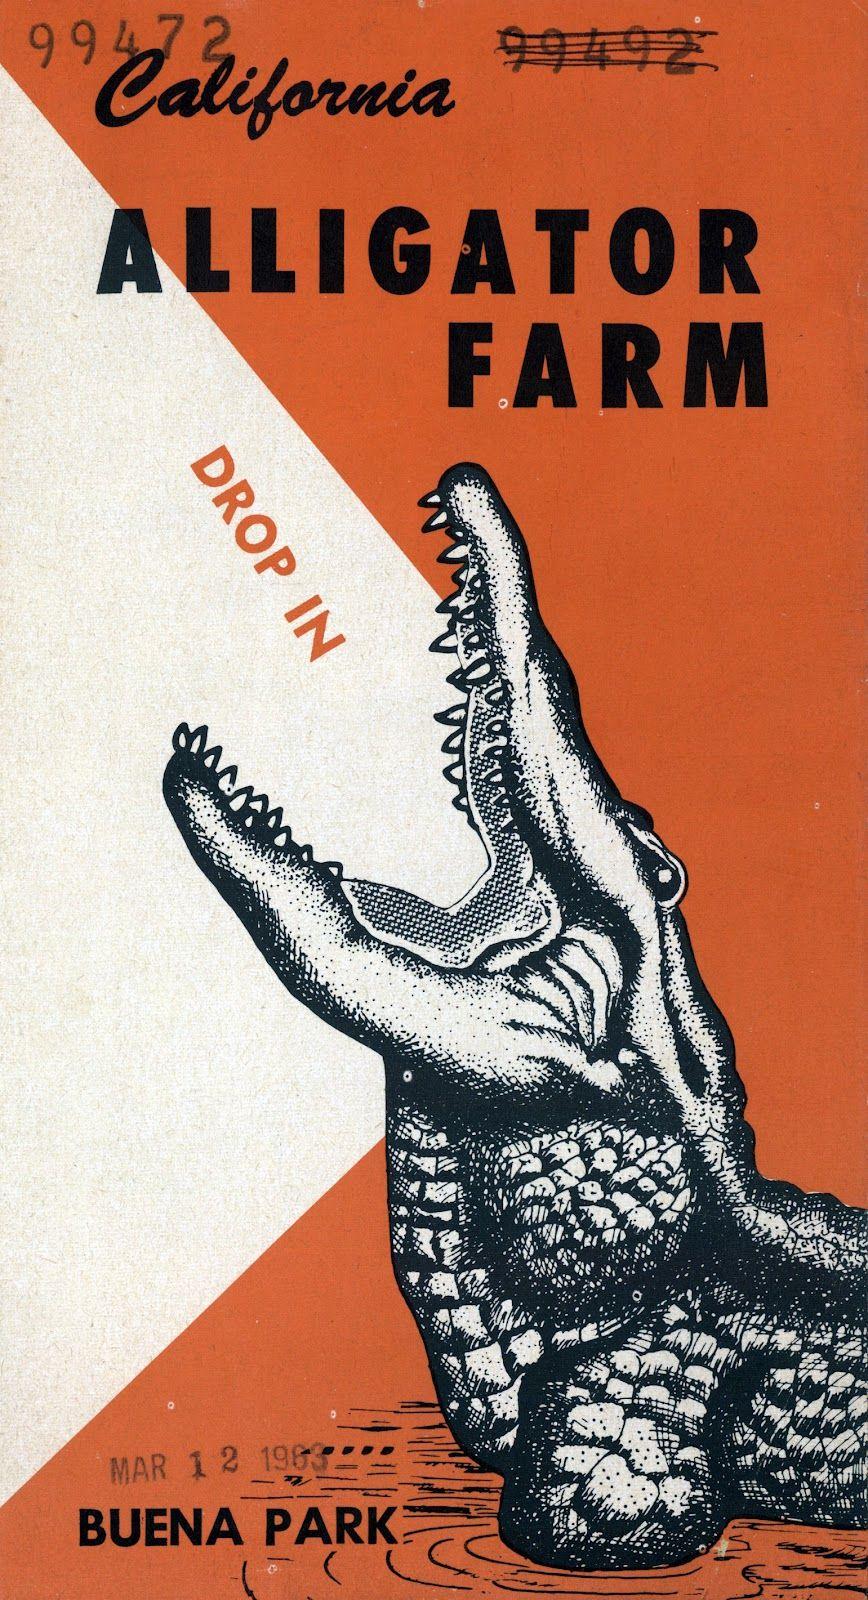 Alligator Farm Buena Park